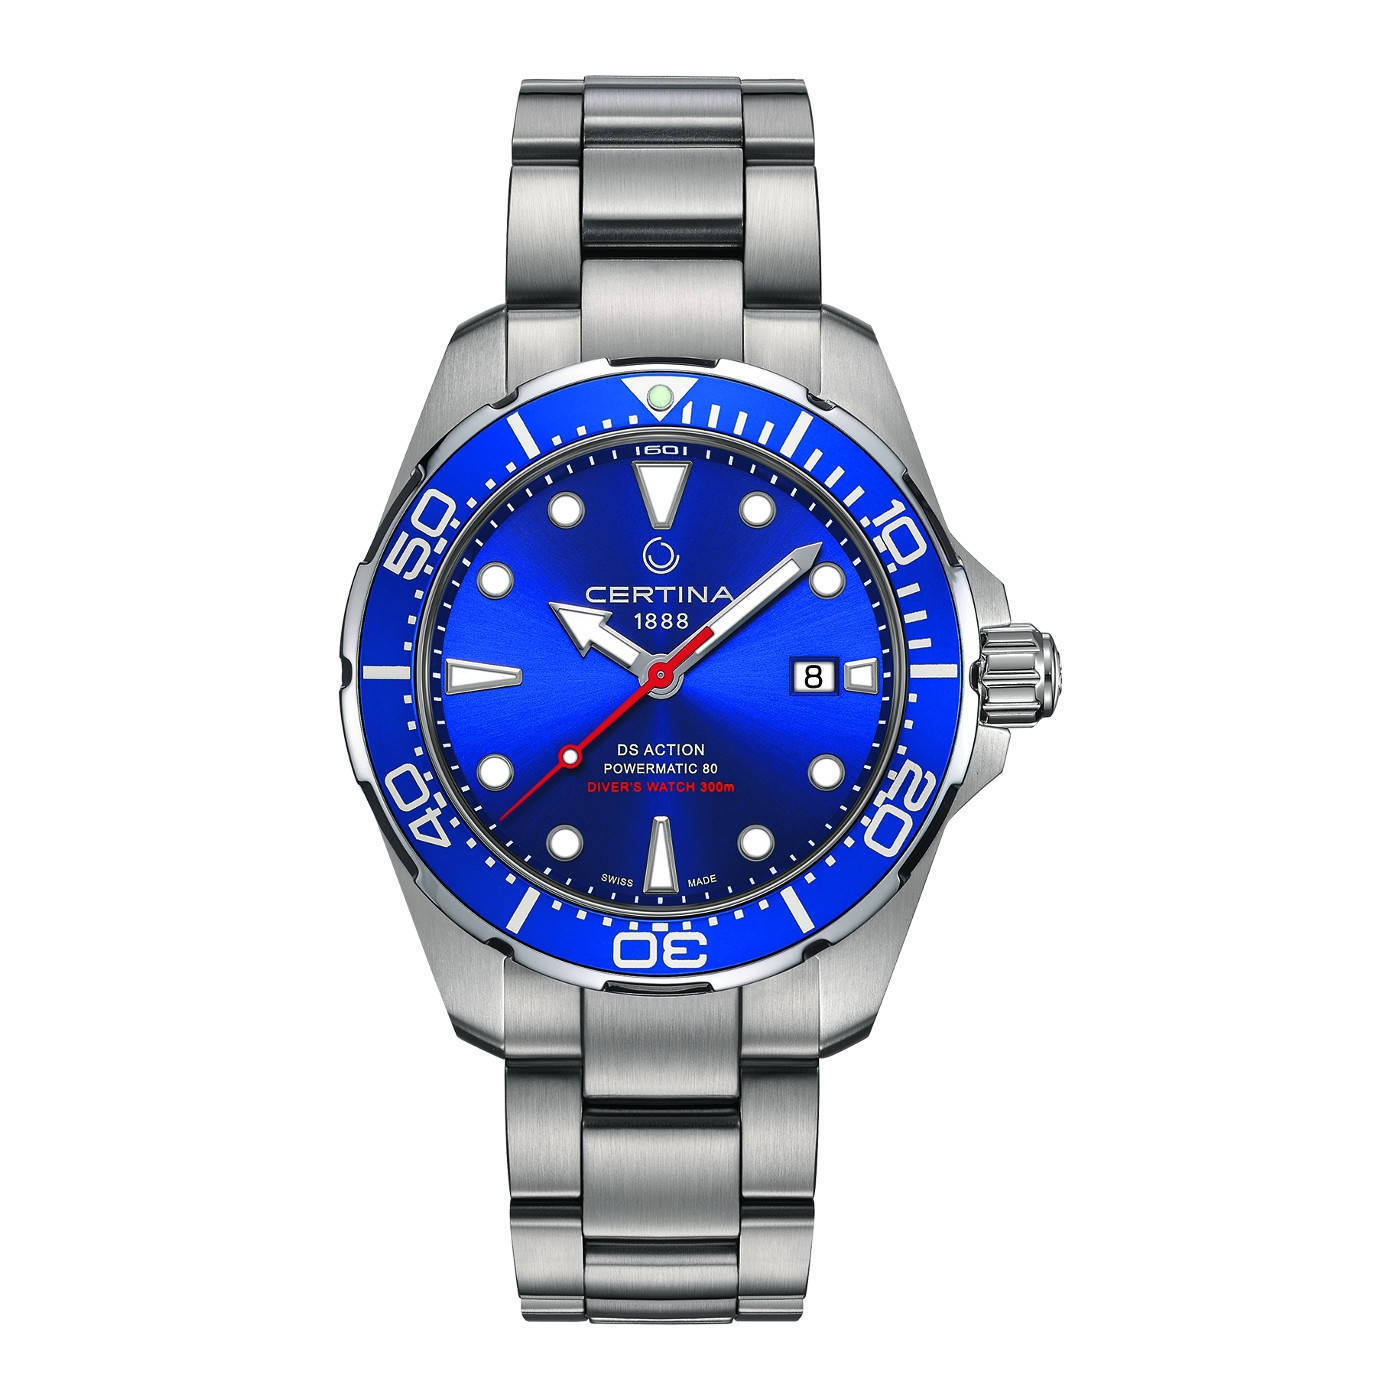 Afbeelding van Certina Aqua Action Diver Automaat horloge C032.407.11.041.00